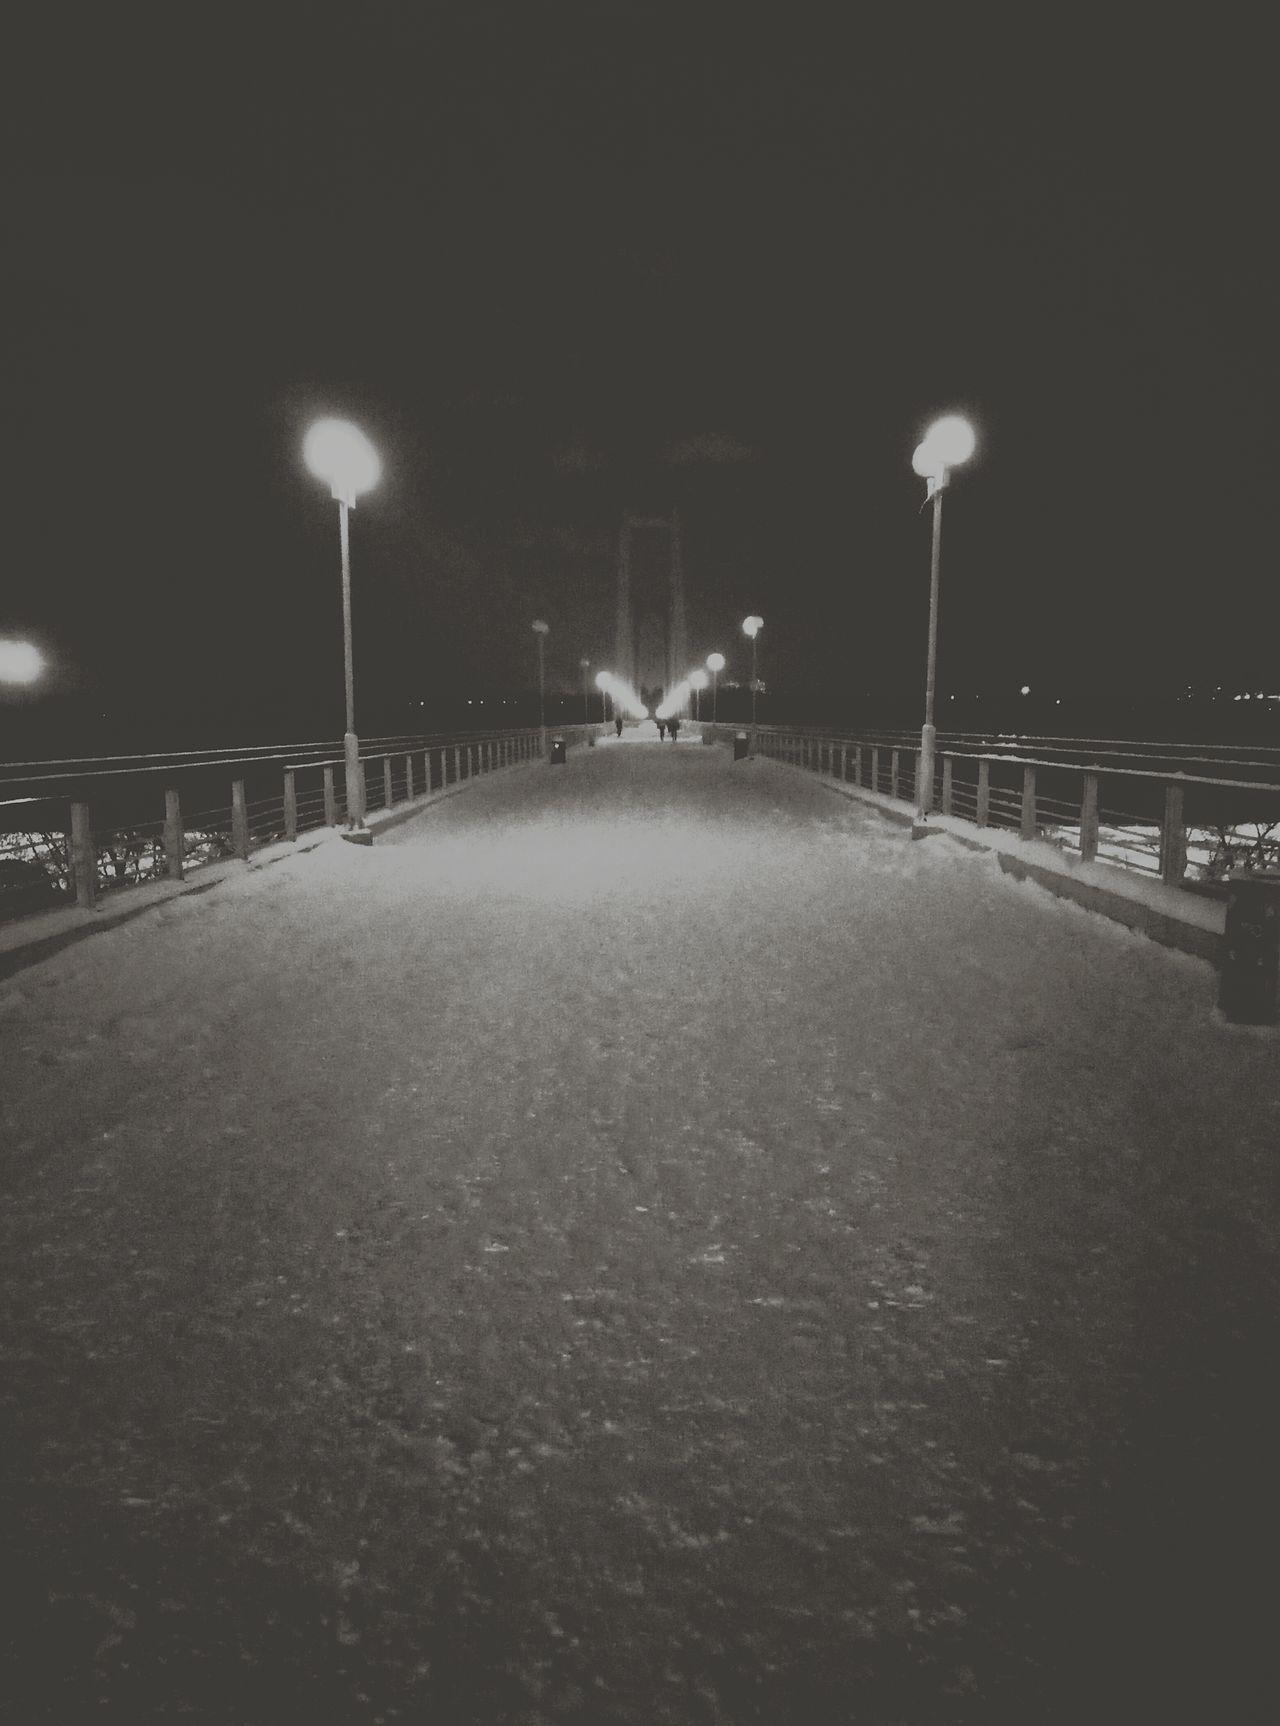 Night Illuminated Outdoors Россия Russia Bw черно-белое красноярск Krasnoyarsk мост фонари смметрия